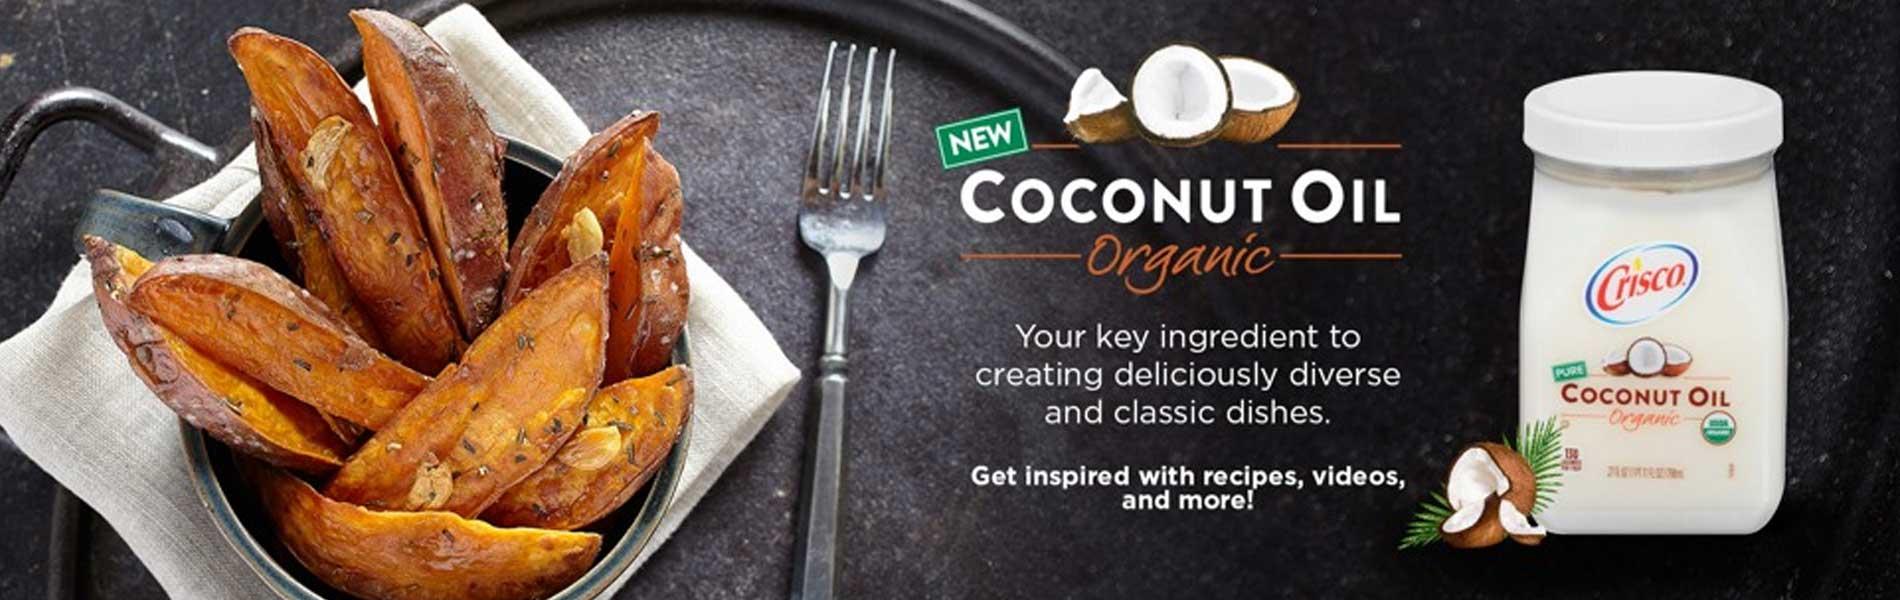 Crisco introduces new organic coconut oil crisco forumfinder Images